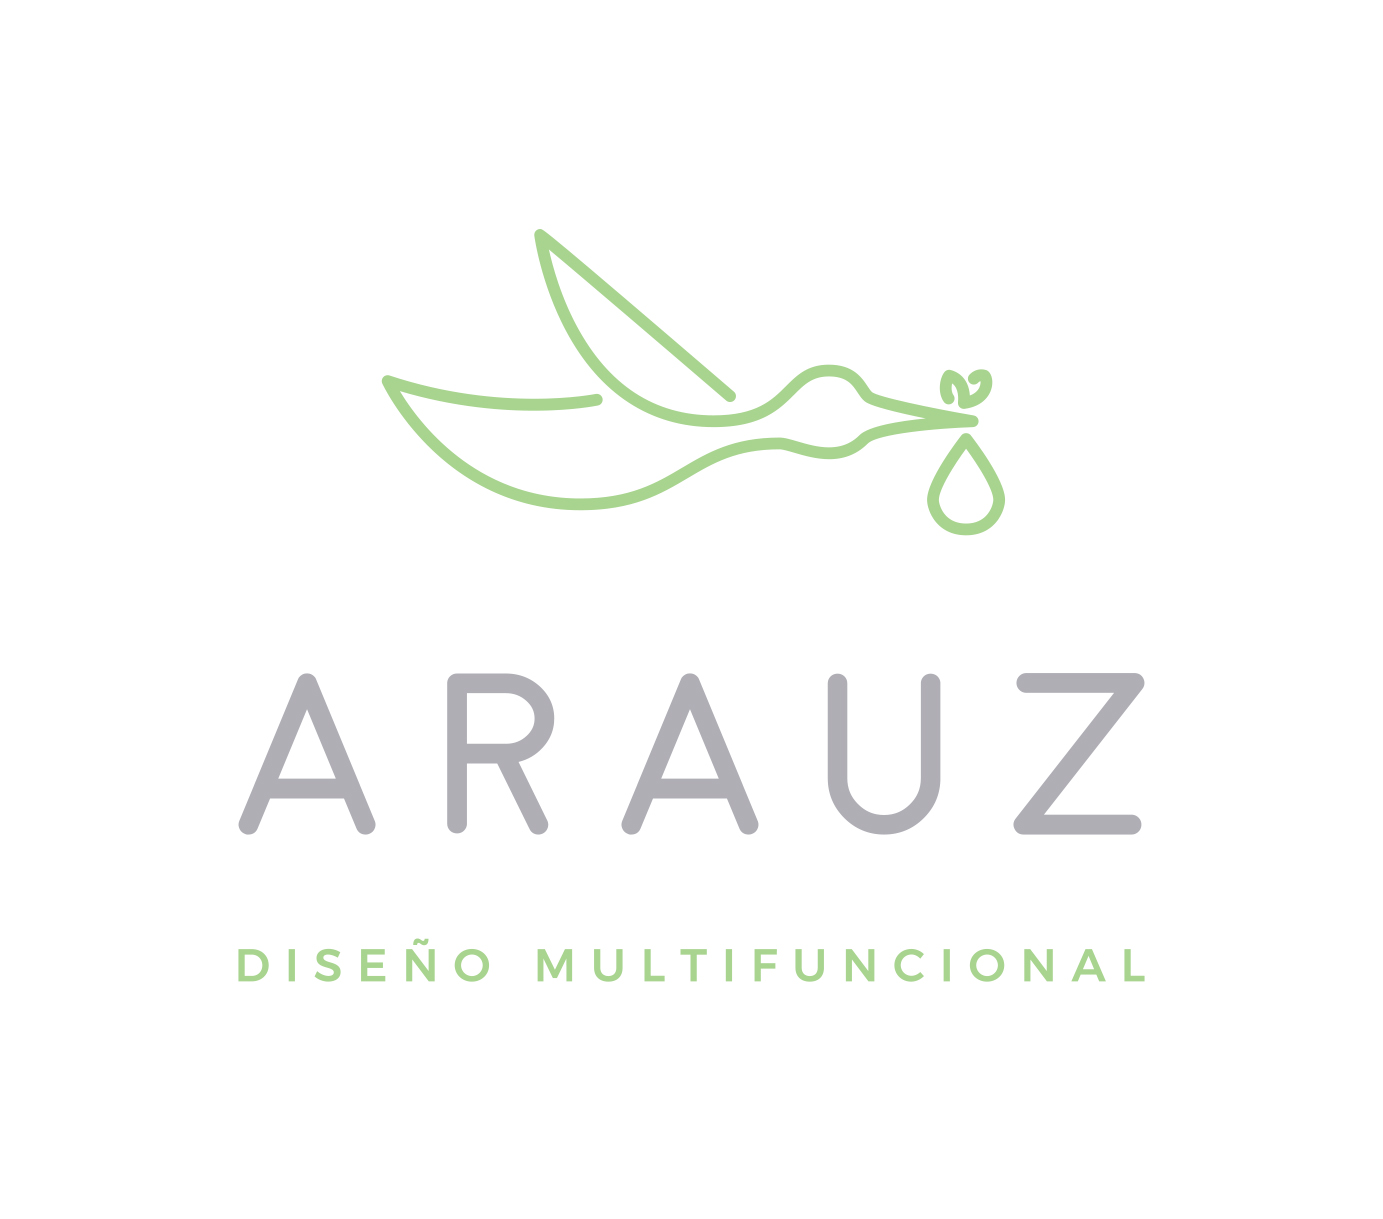 ARAUZ